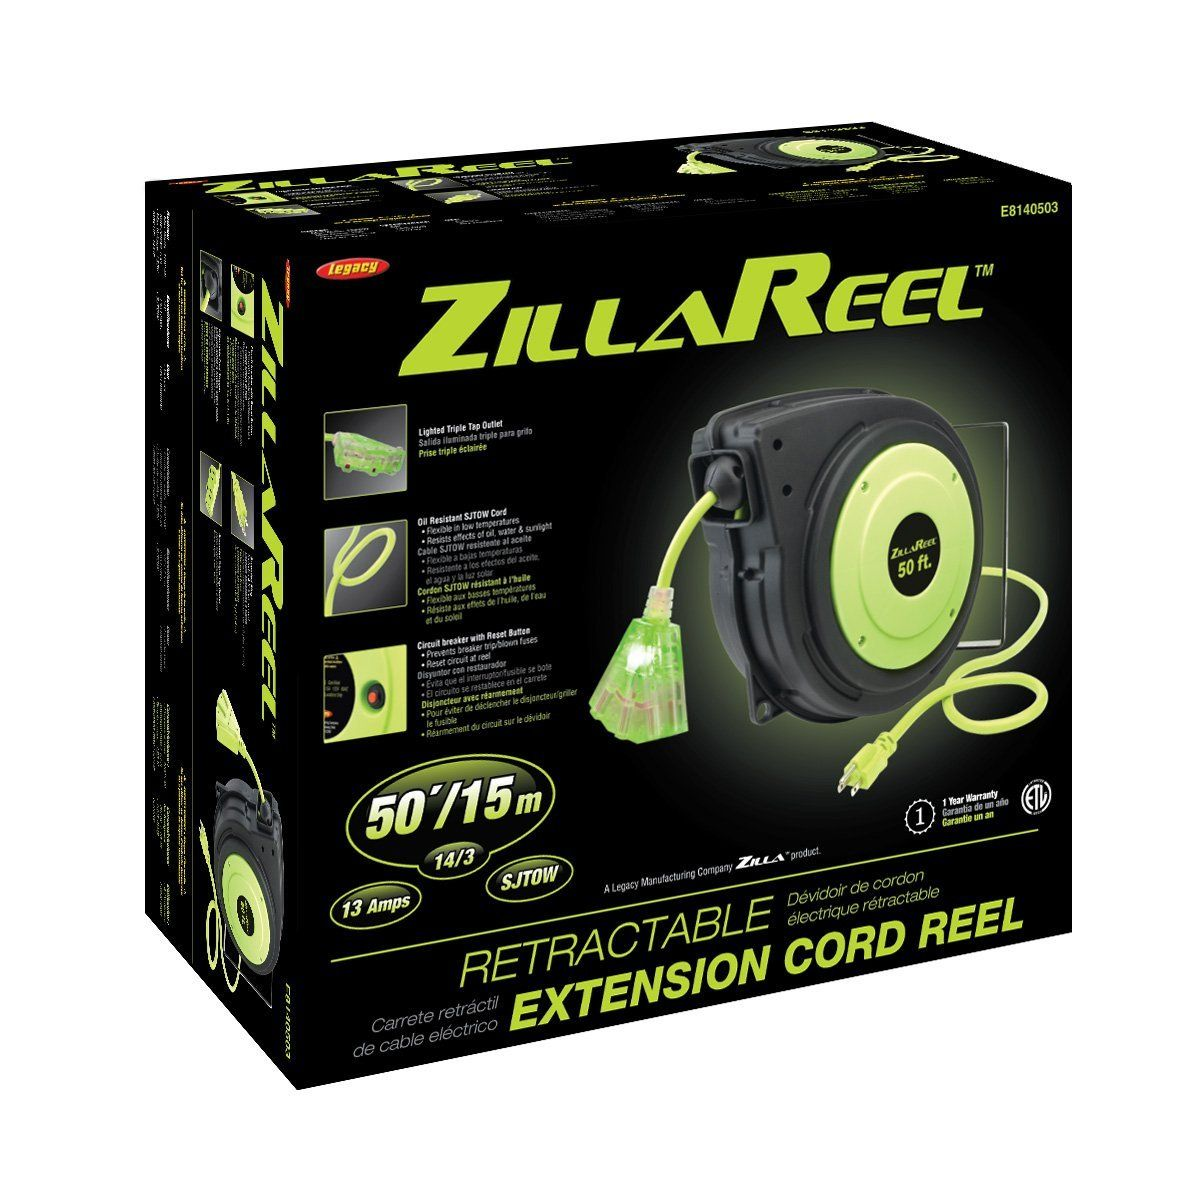 E8140503 Standard Flexzilla ZillaReel 50 ft Retractable Extension Cord Reel